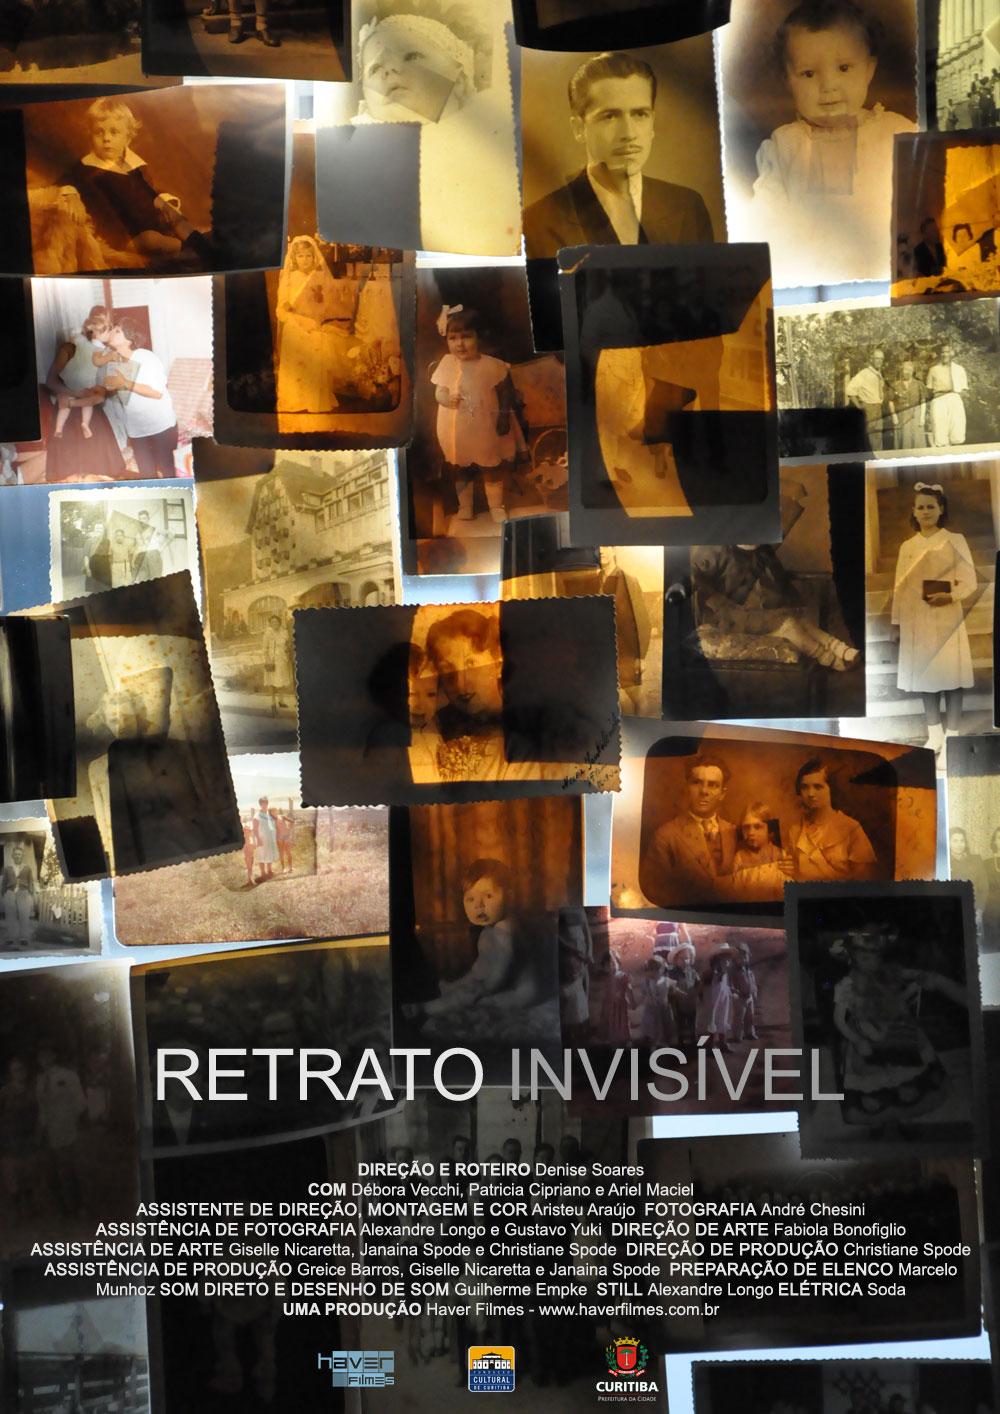 RETRATO INVISÍVEL (2013)